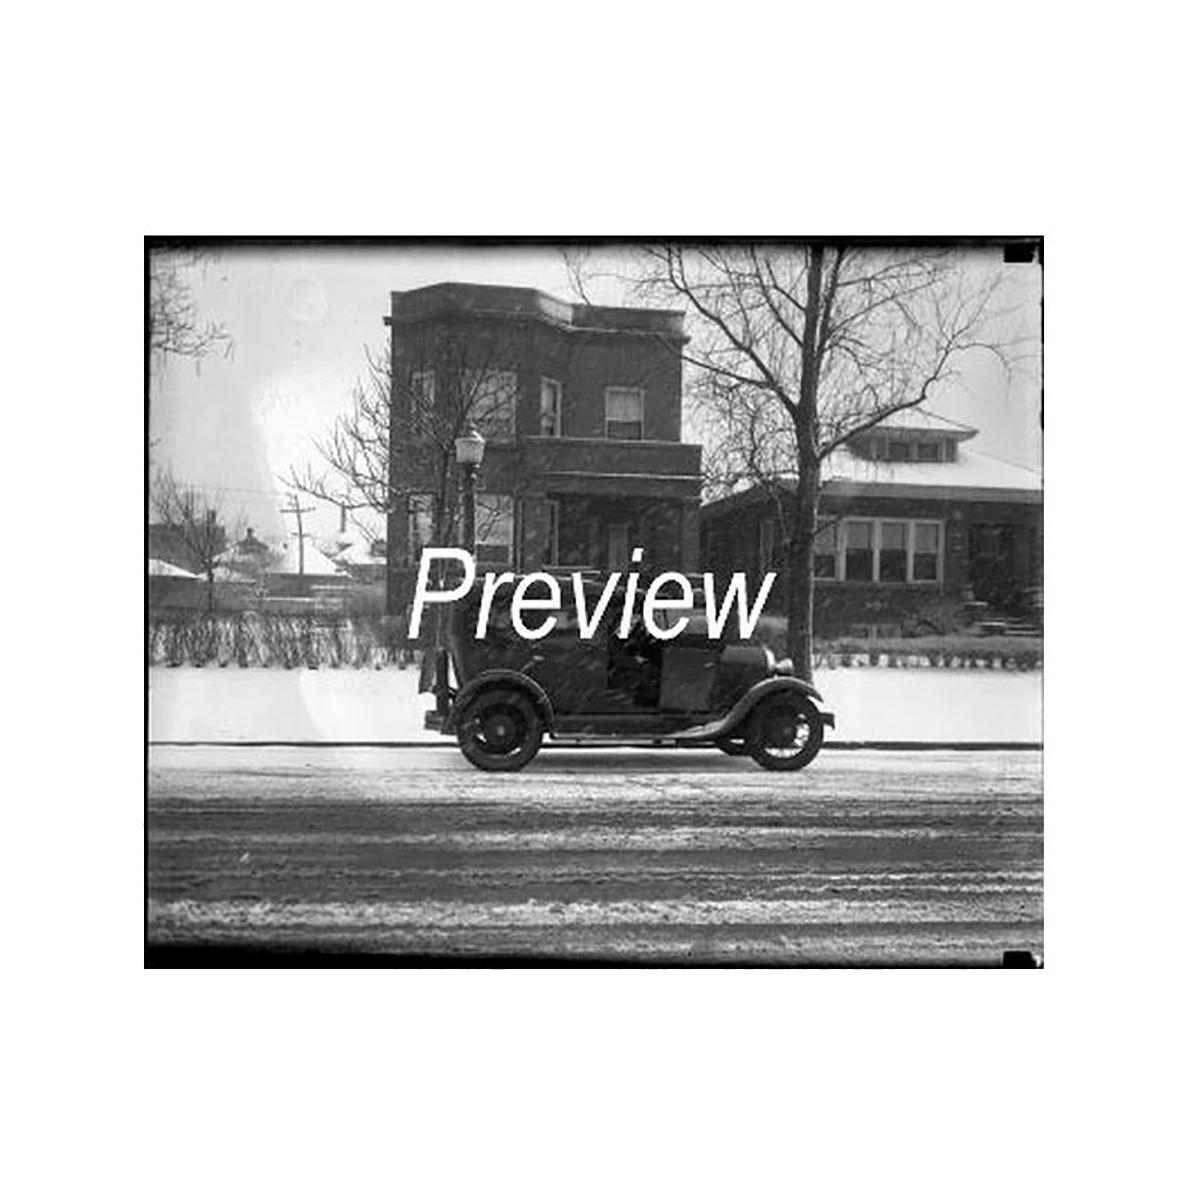 Al Capone's House Photograph (1930)